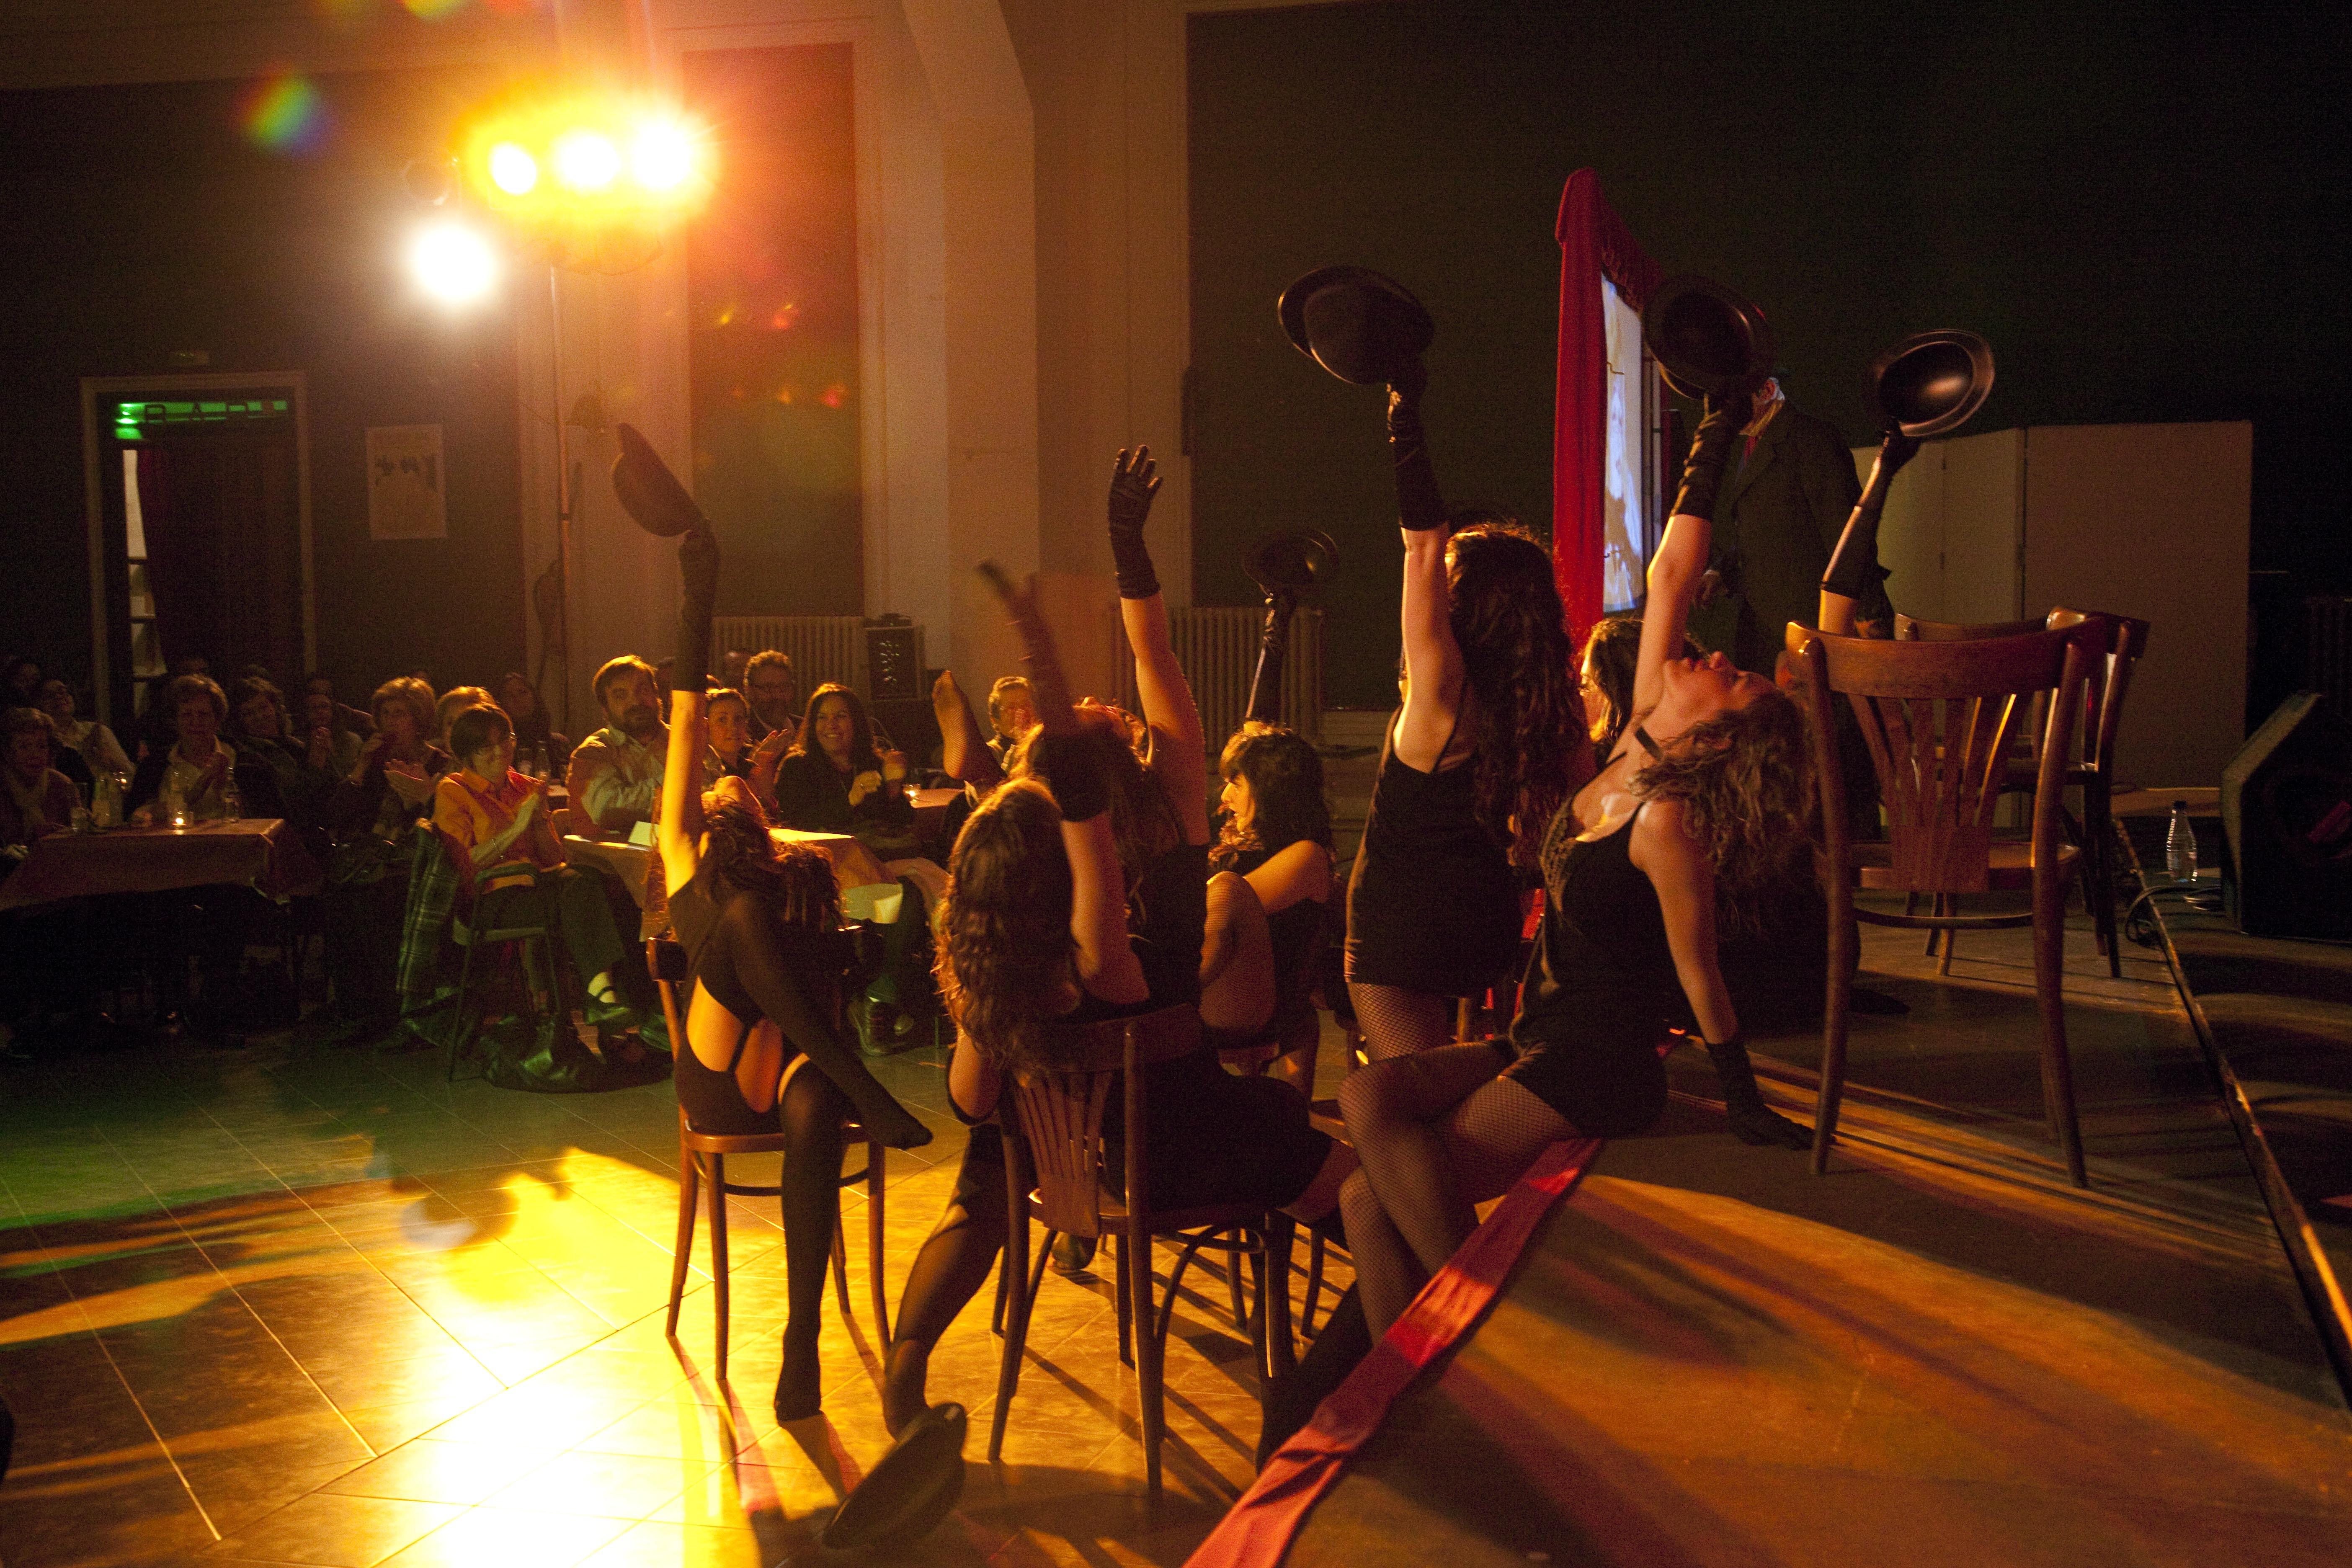 cabaret solsona 22abr2010_2078